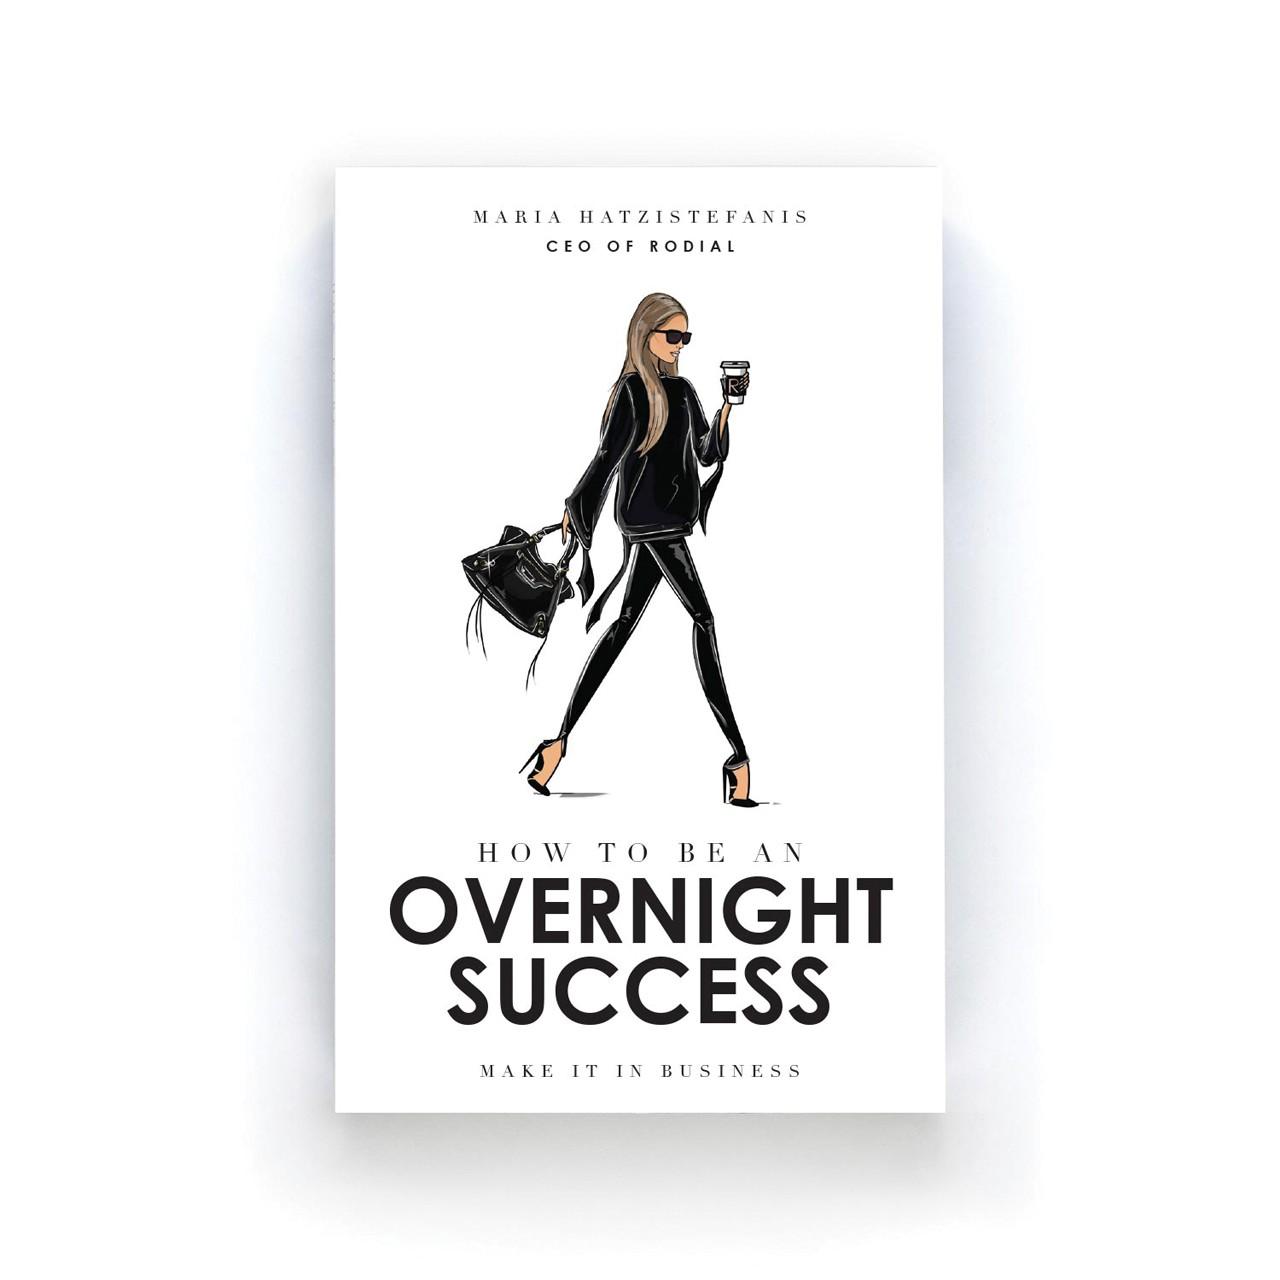 overnightsuccess.jpg